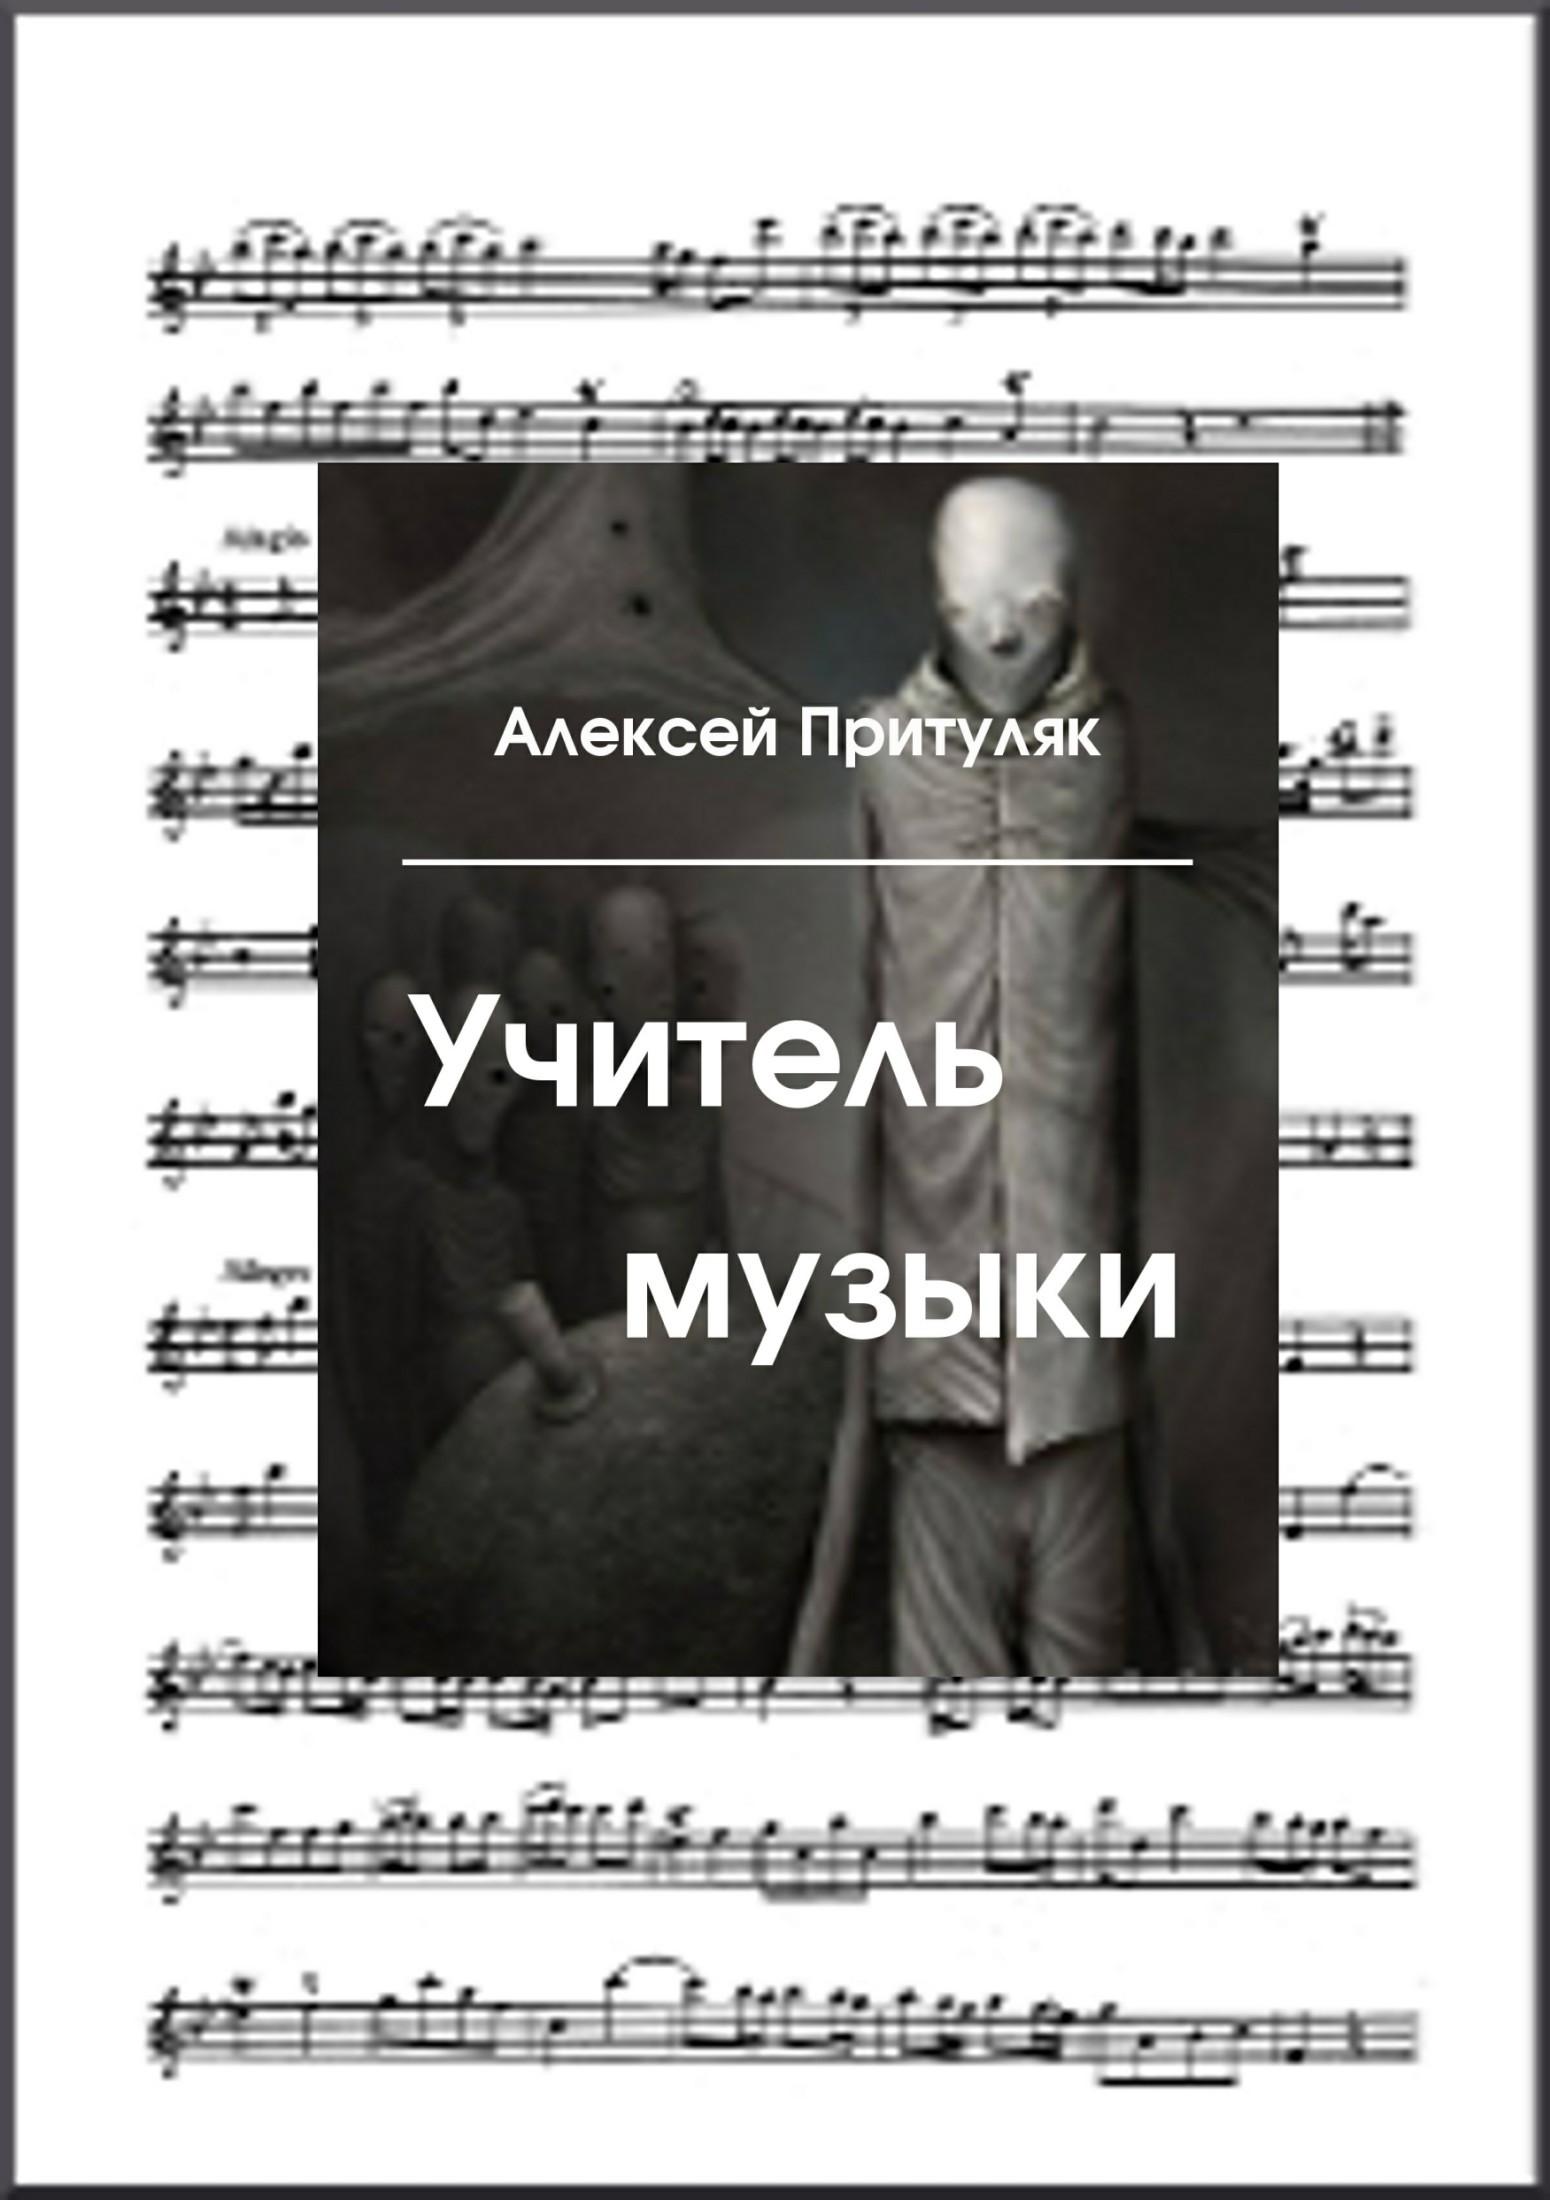 Алексей Притуляк. Учитель музыки